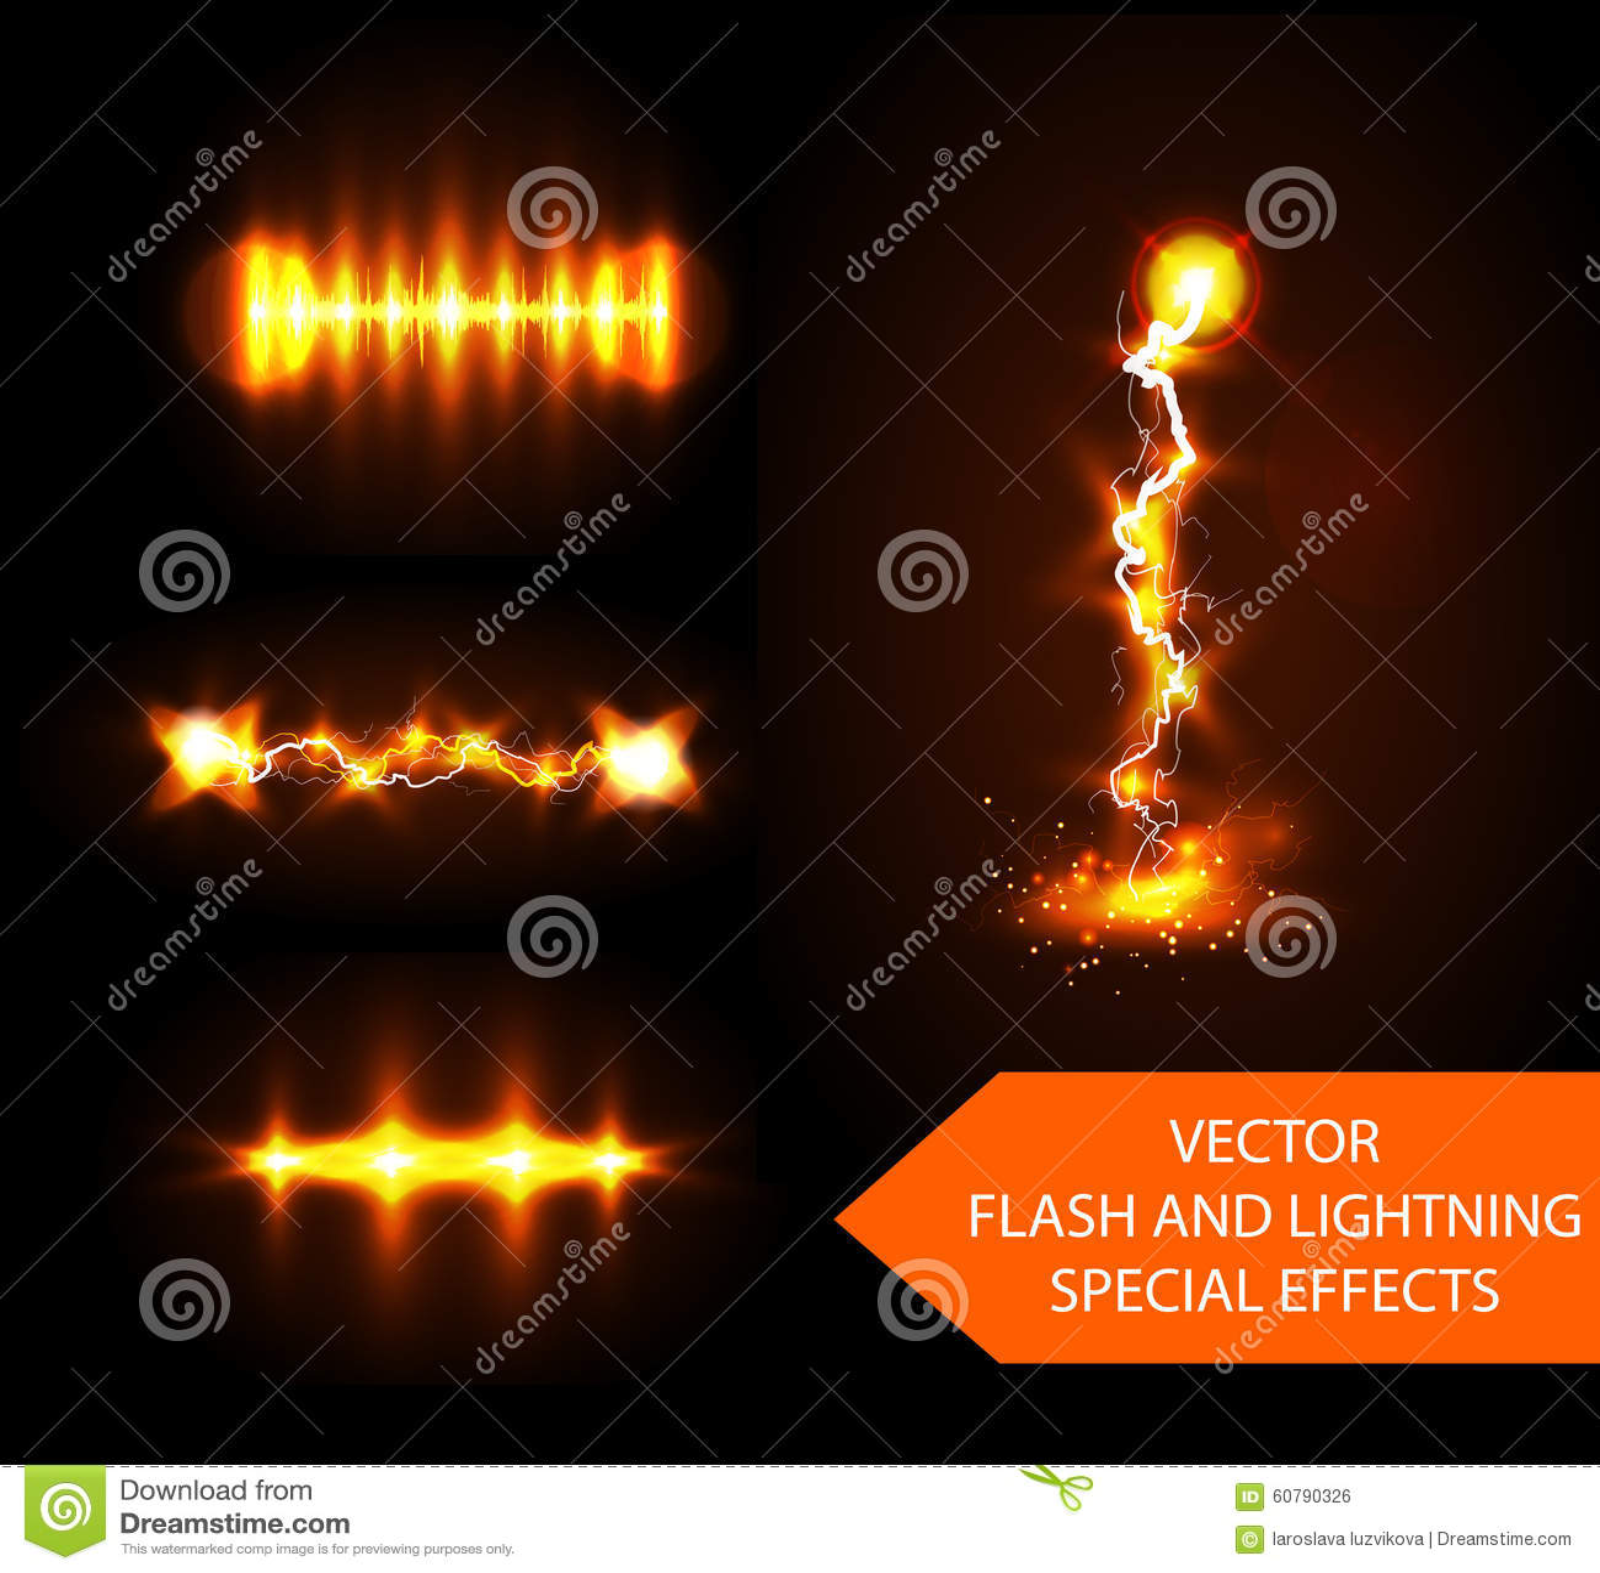 Vector flash effects stock vector  Illustration of bolt - 60790326